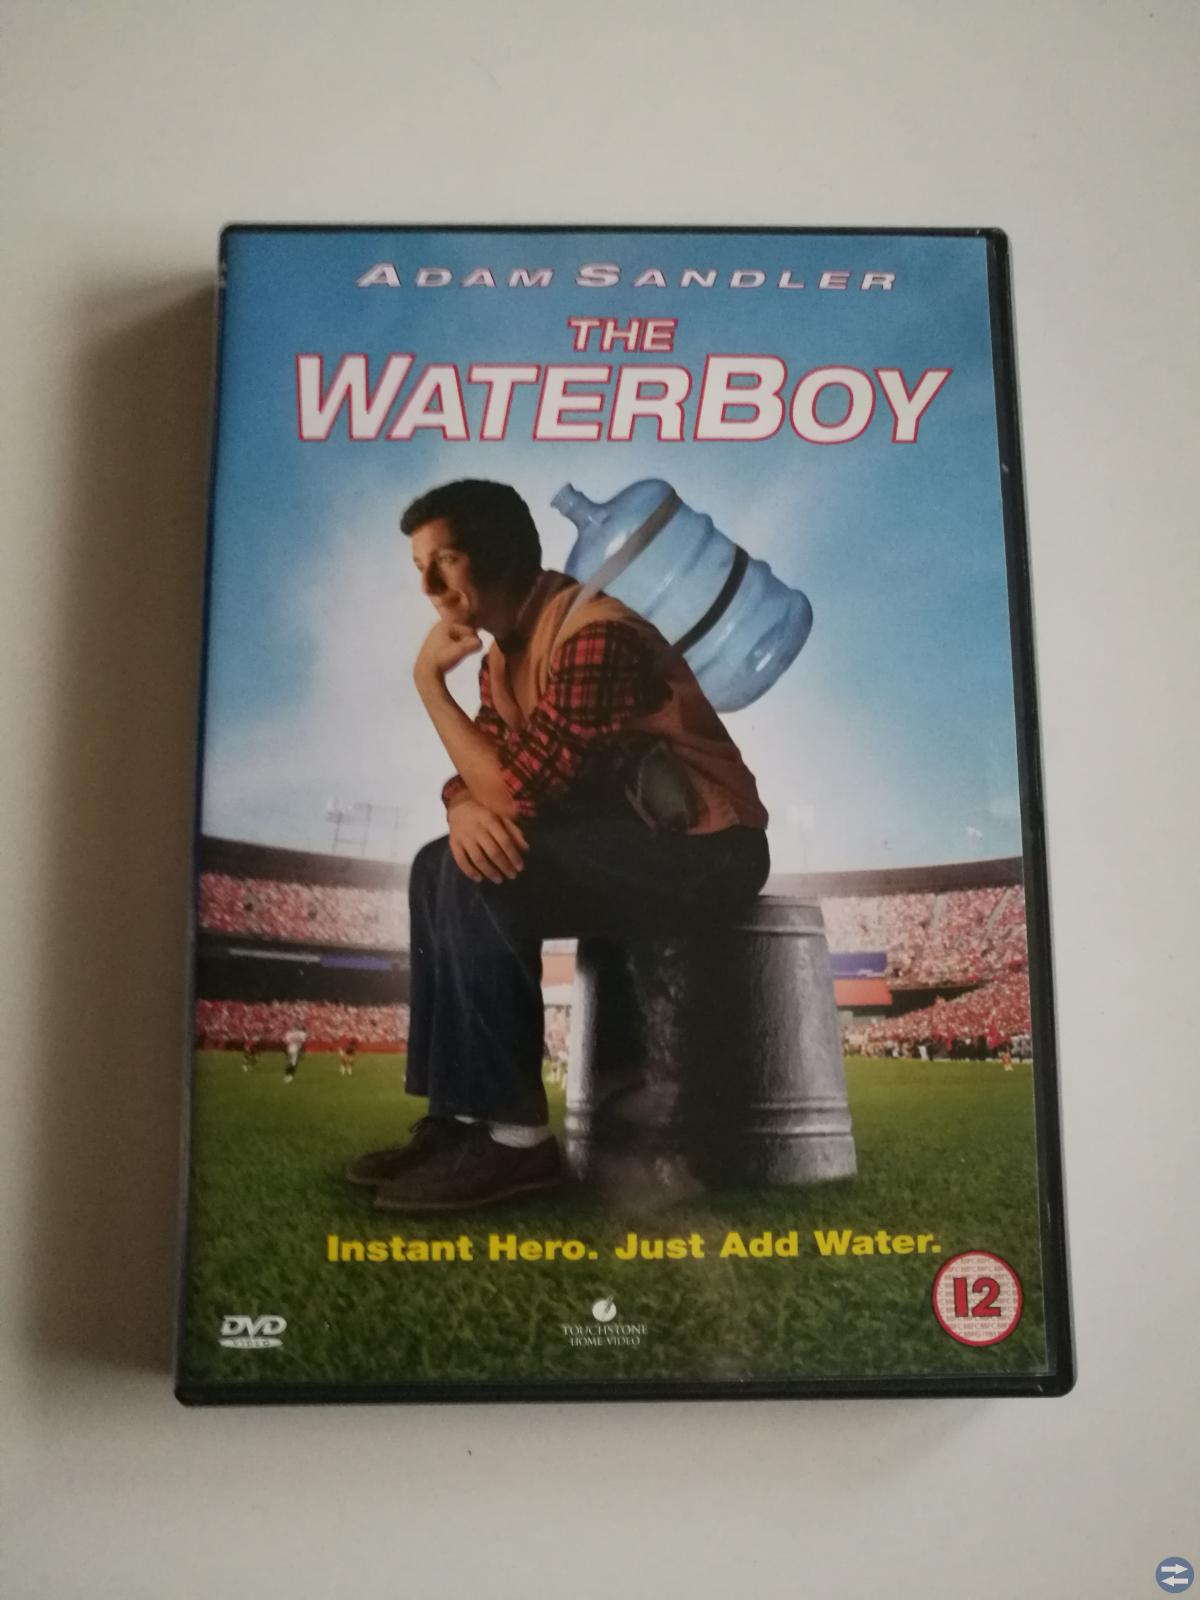 Water boy (DVD)